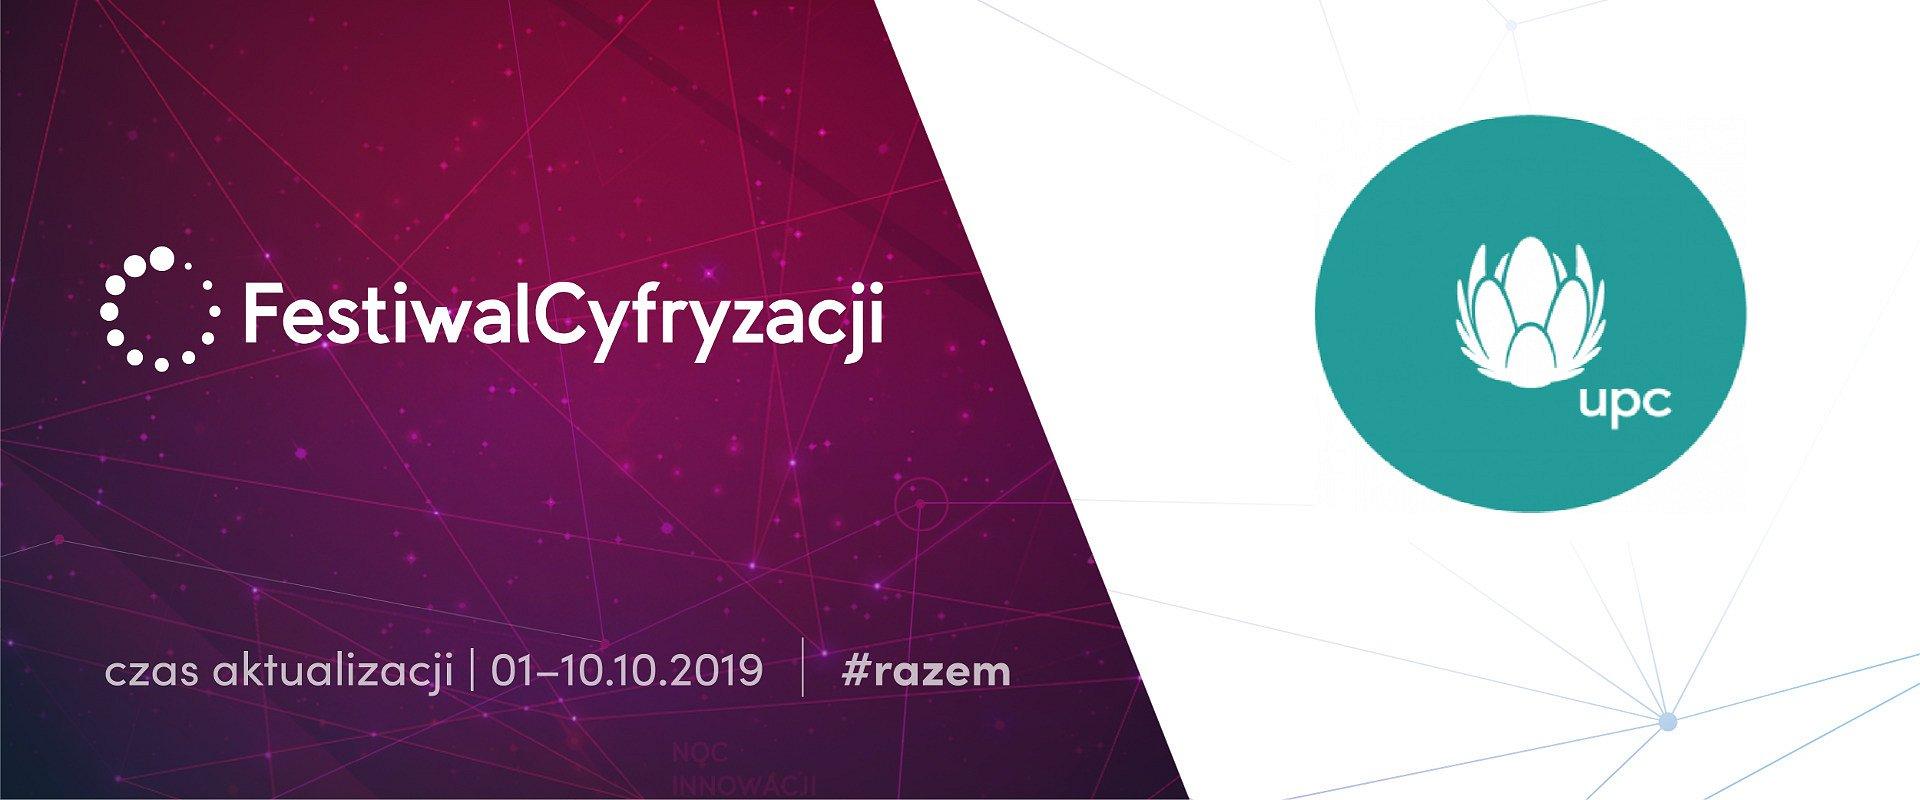 UPC Polska partnerem strategicznym Festiwalu Cyfryzacji!